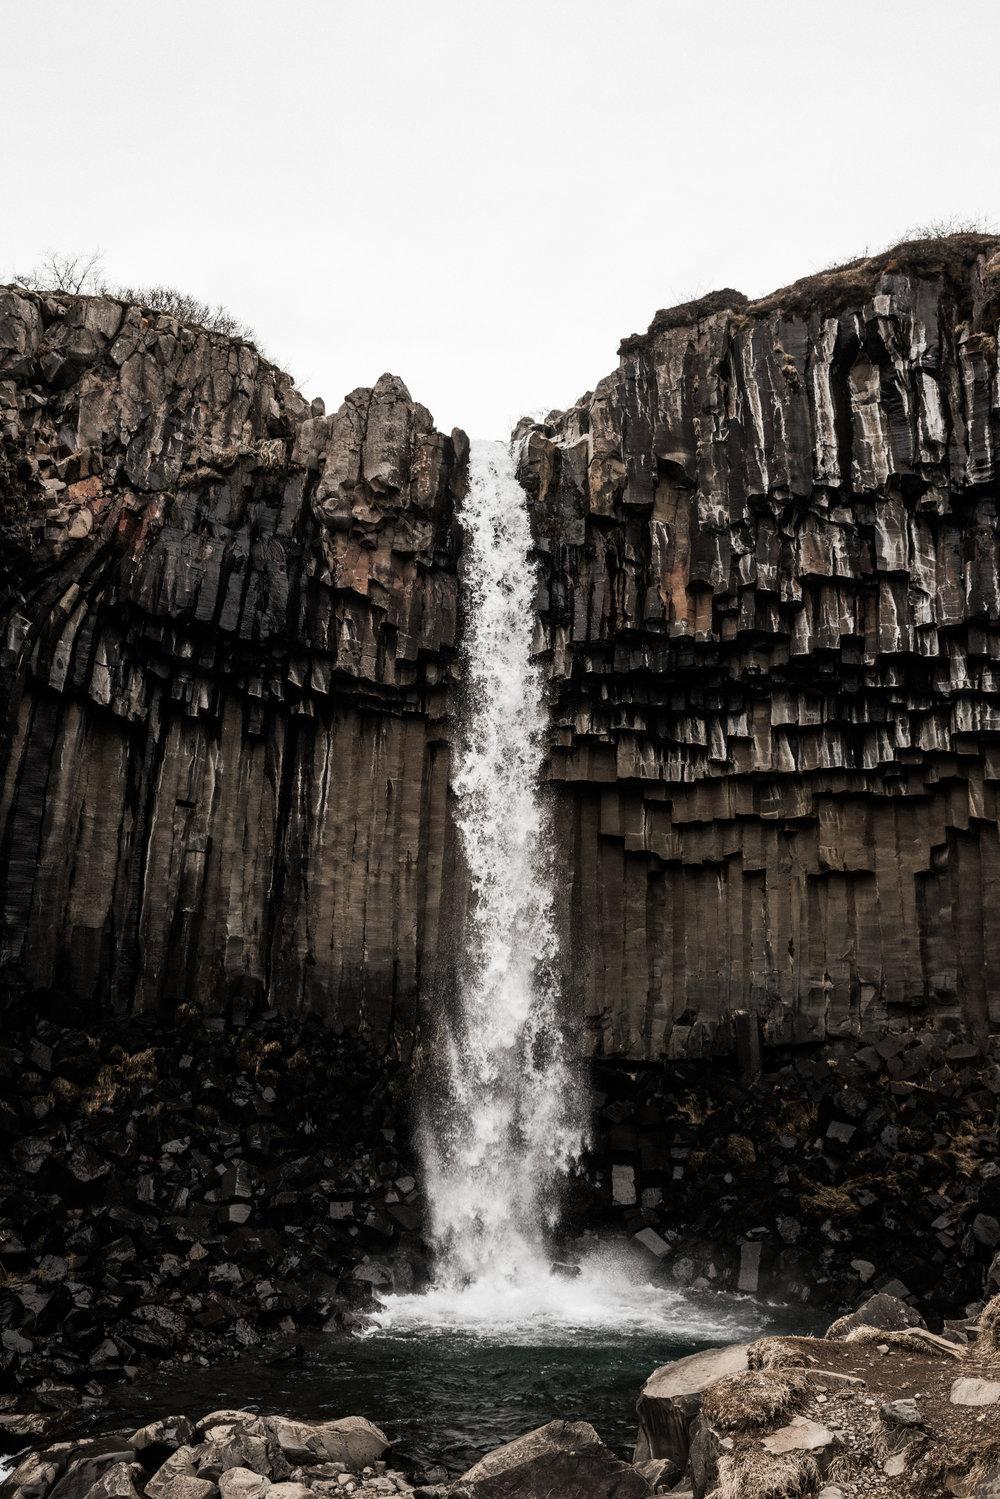 ICELAND_WOMAN_PHOTOGRAPHER_TARASHUPE_OUTDOOR_PHOTOGRAPHY_121.jpg